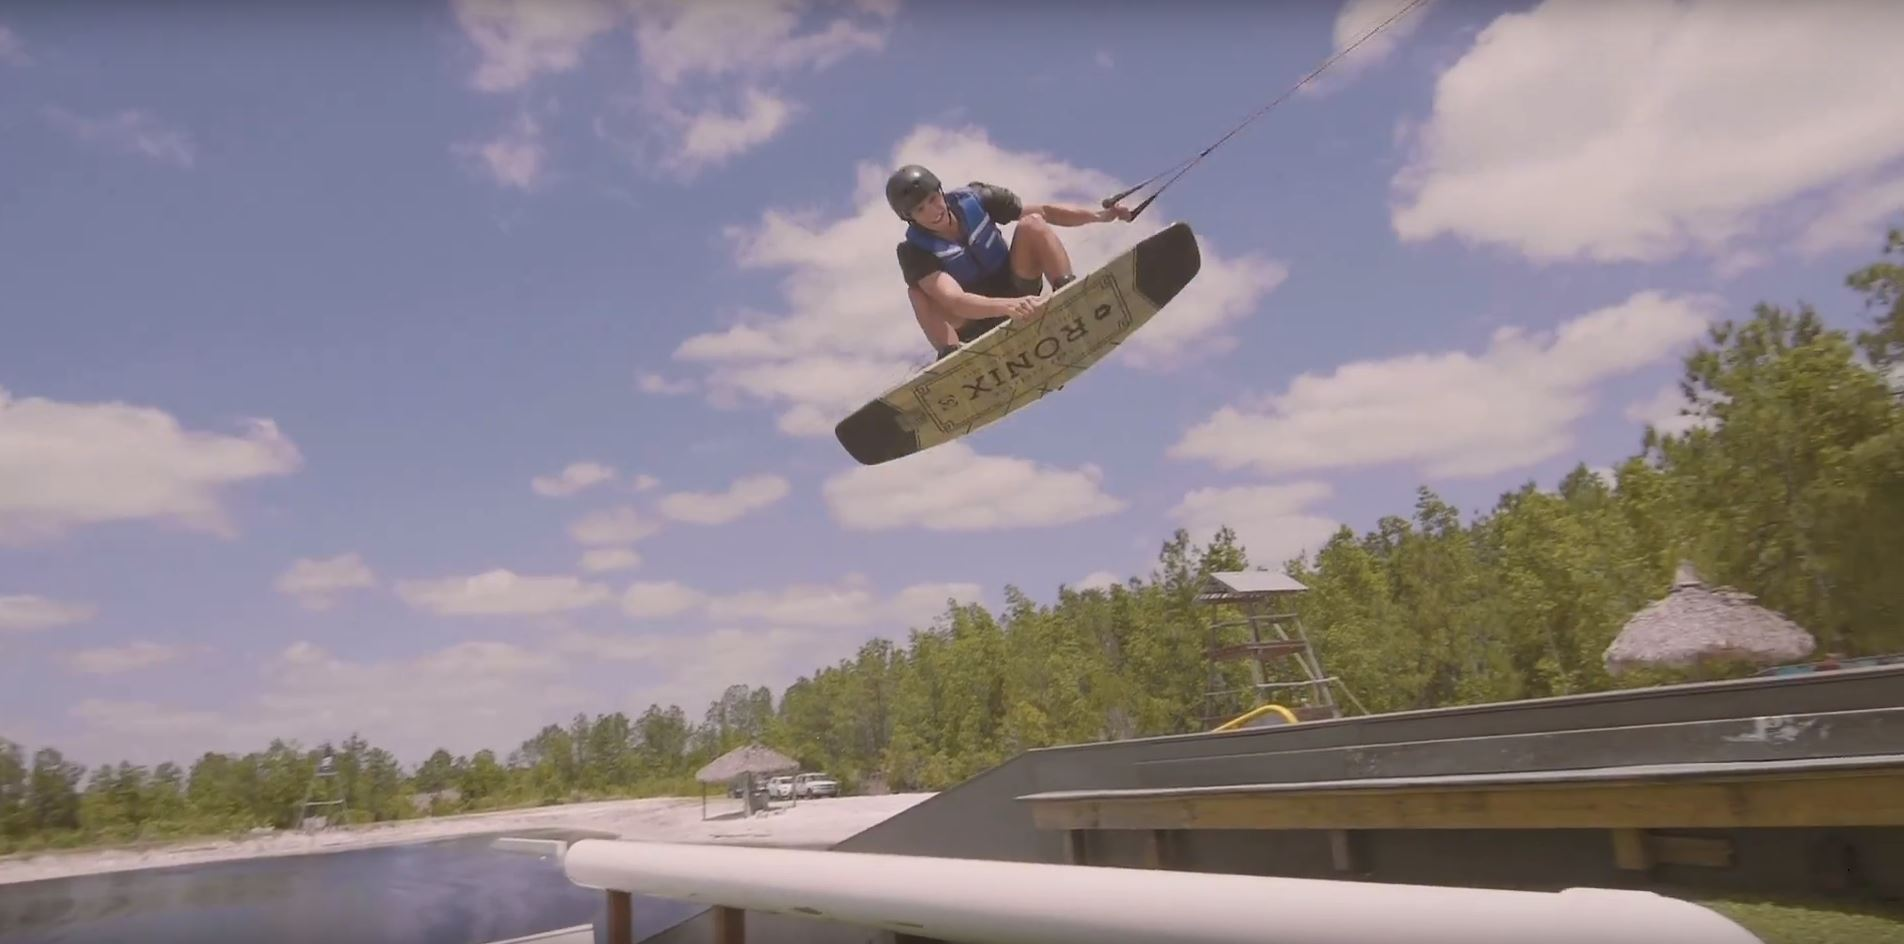 Timo Kapl Summer 2018 Edit at Lake Ronix